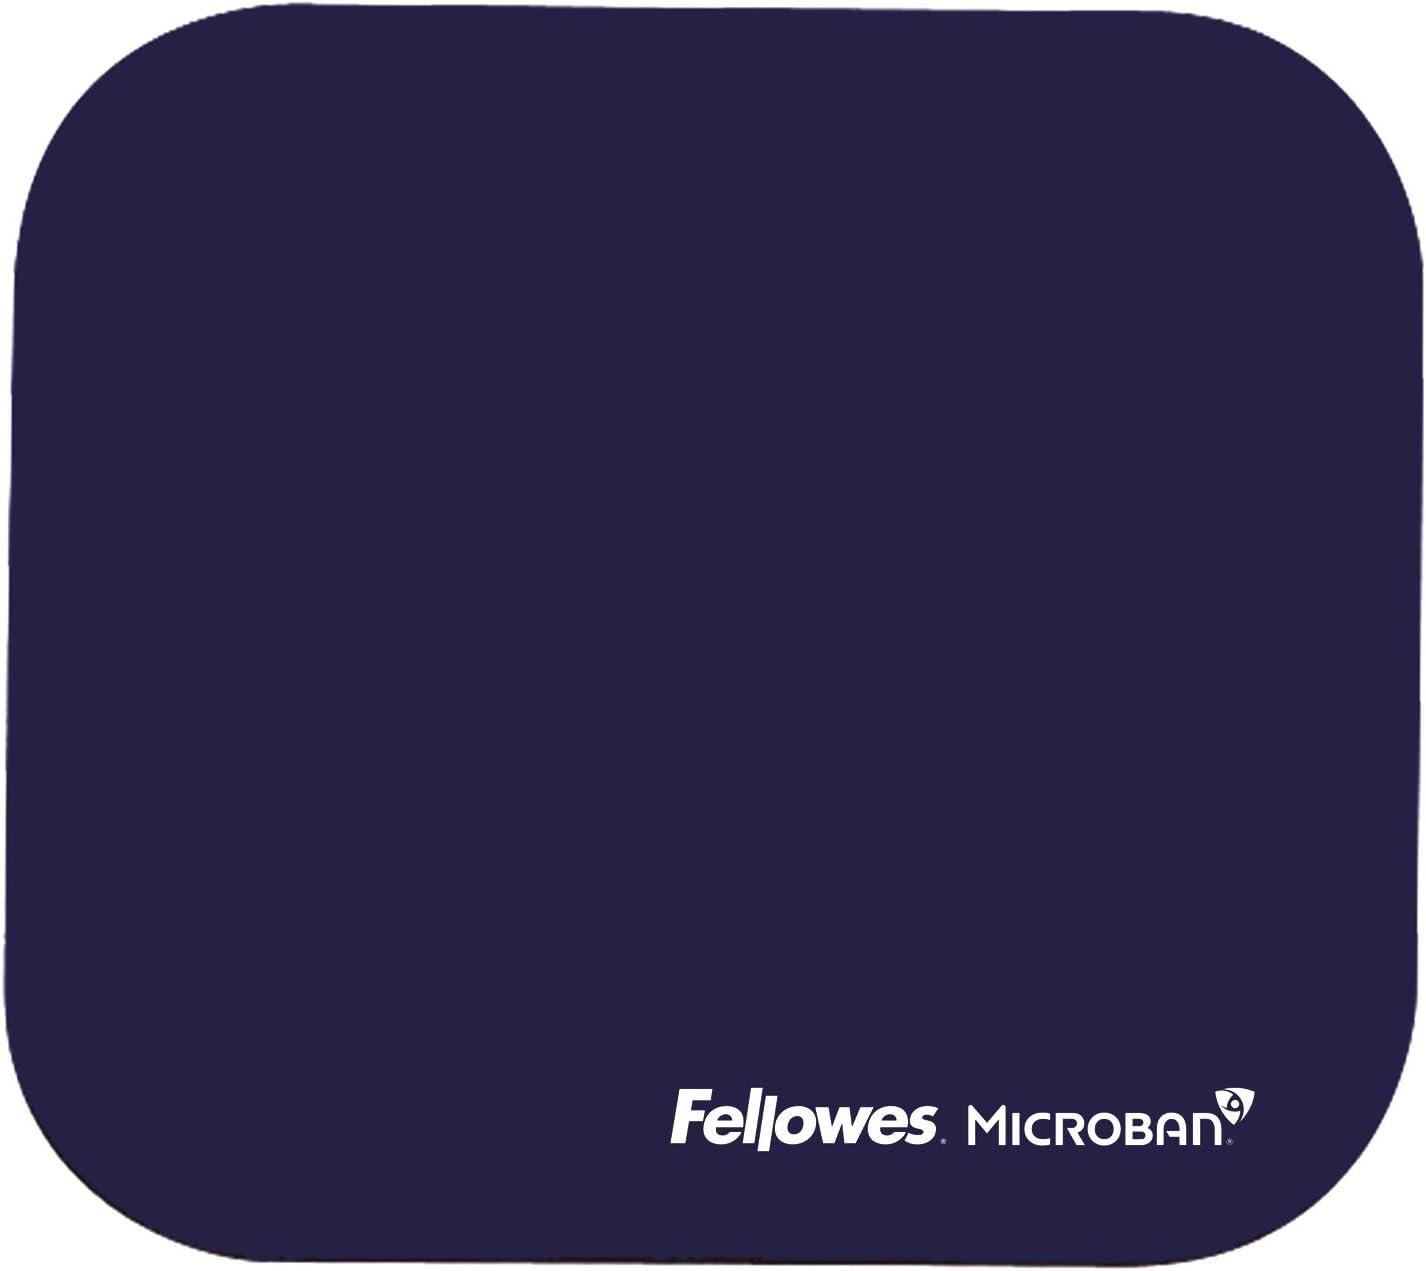 Fellowes 5933805 Tapis de souris avec protection Microban bleu marine